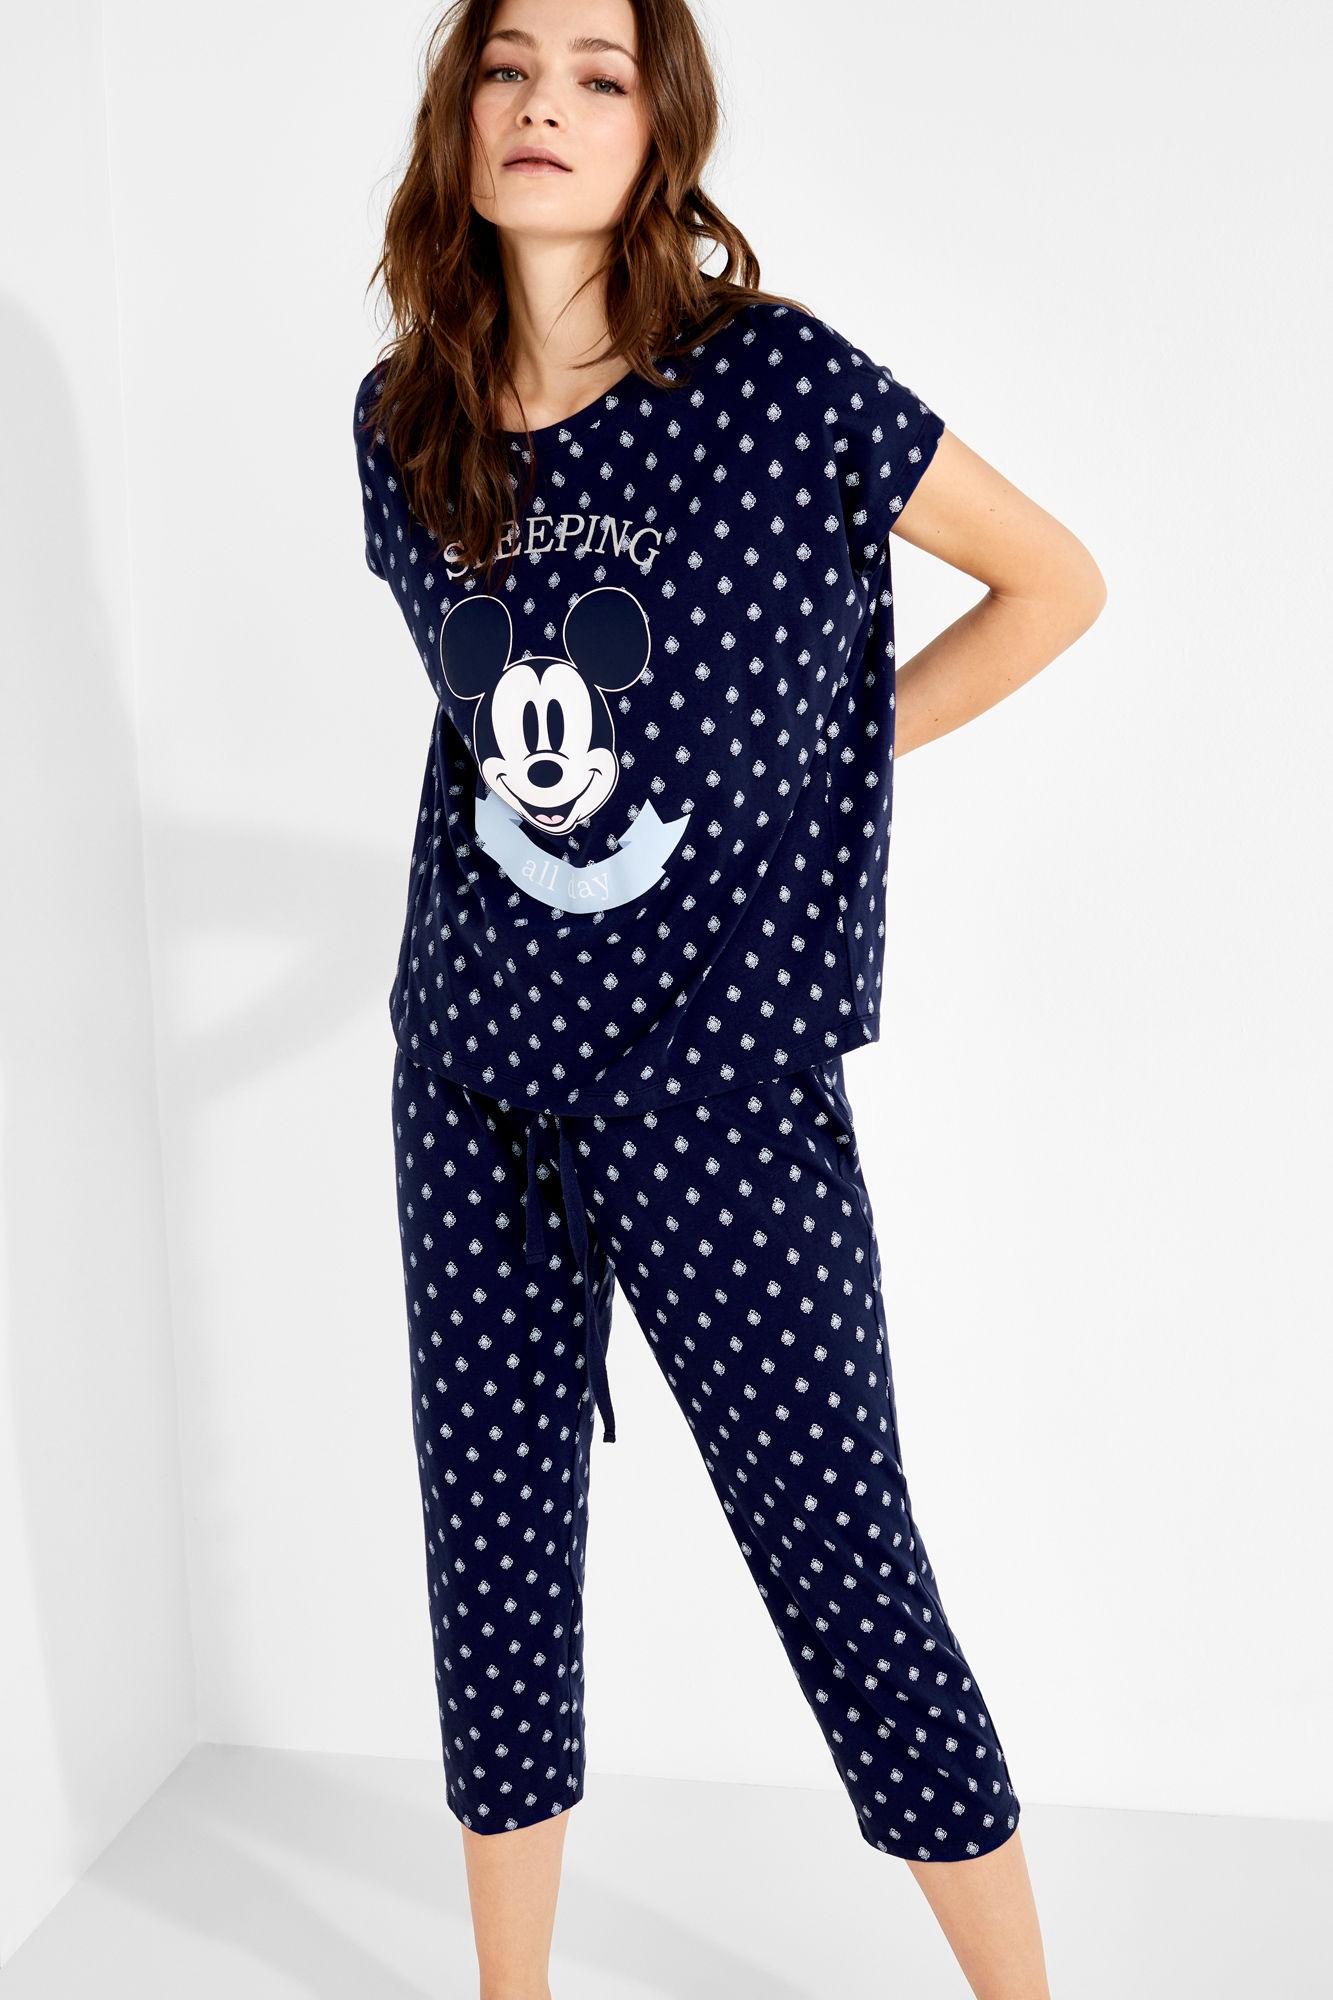 Pijamas Disney a precio Ali